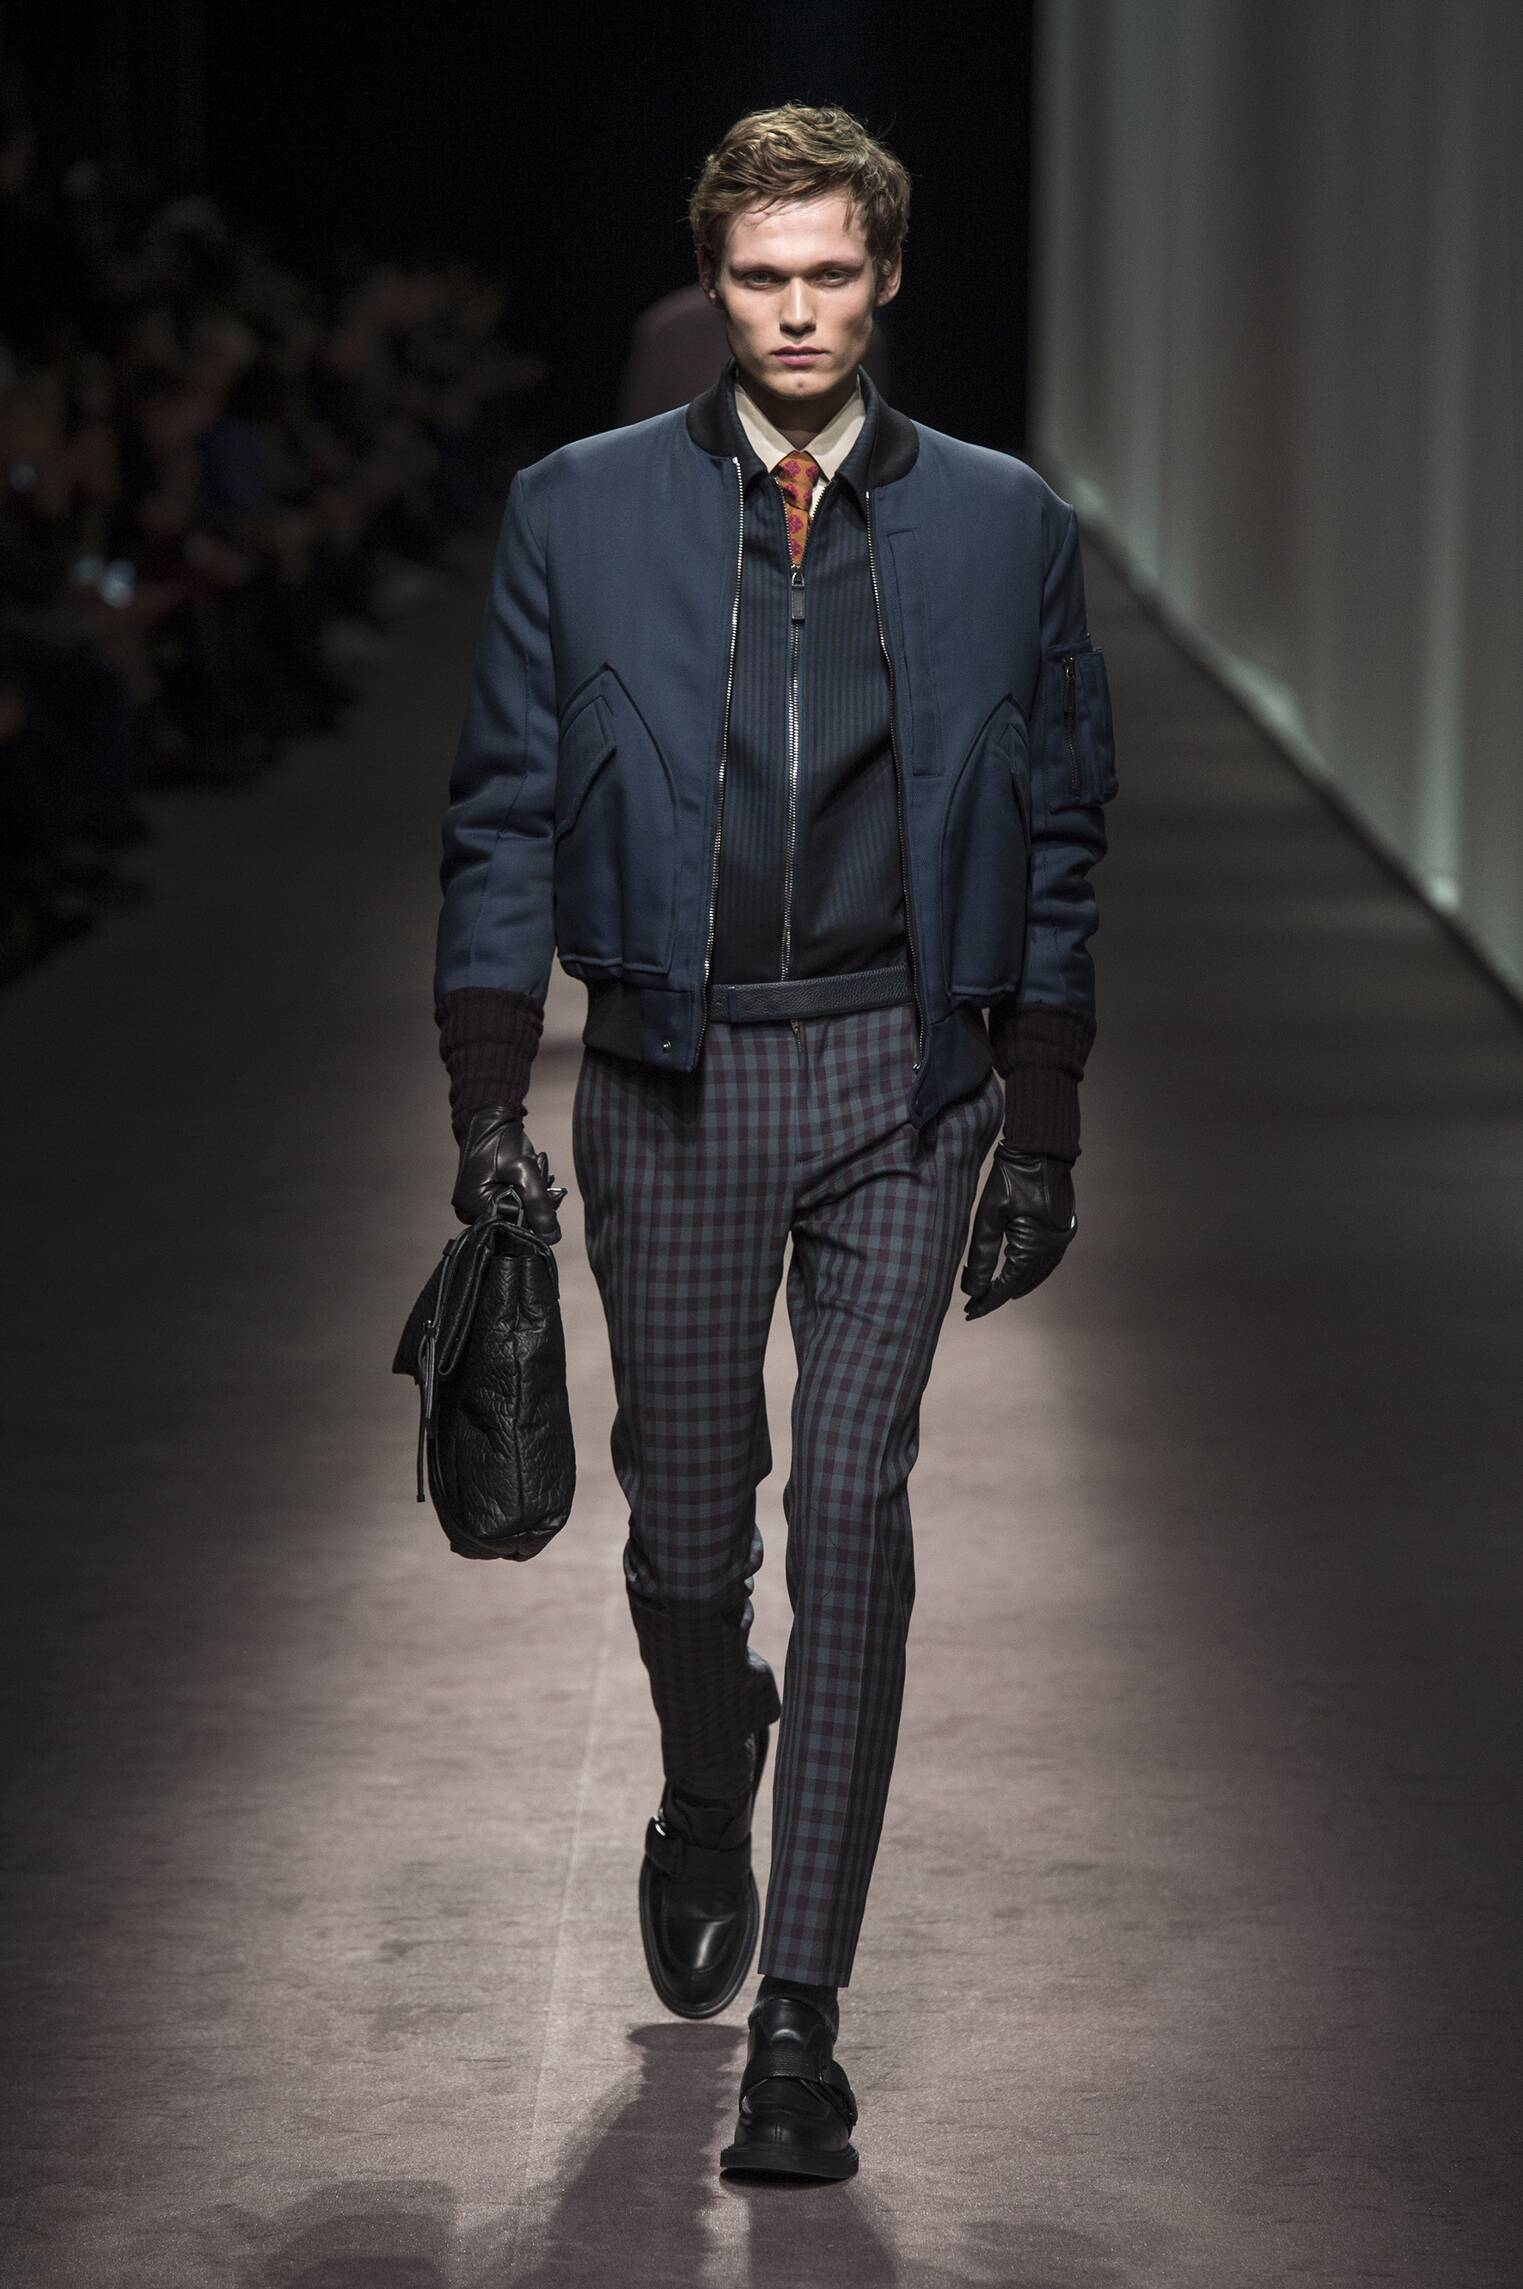 2016 Catwalk Canali Man Fashion Show Winter